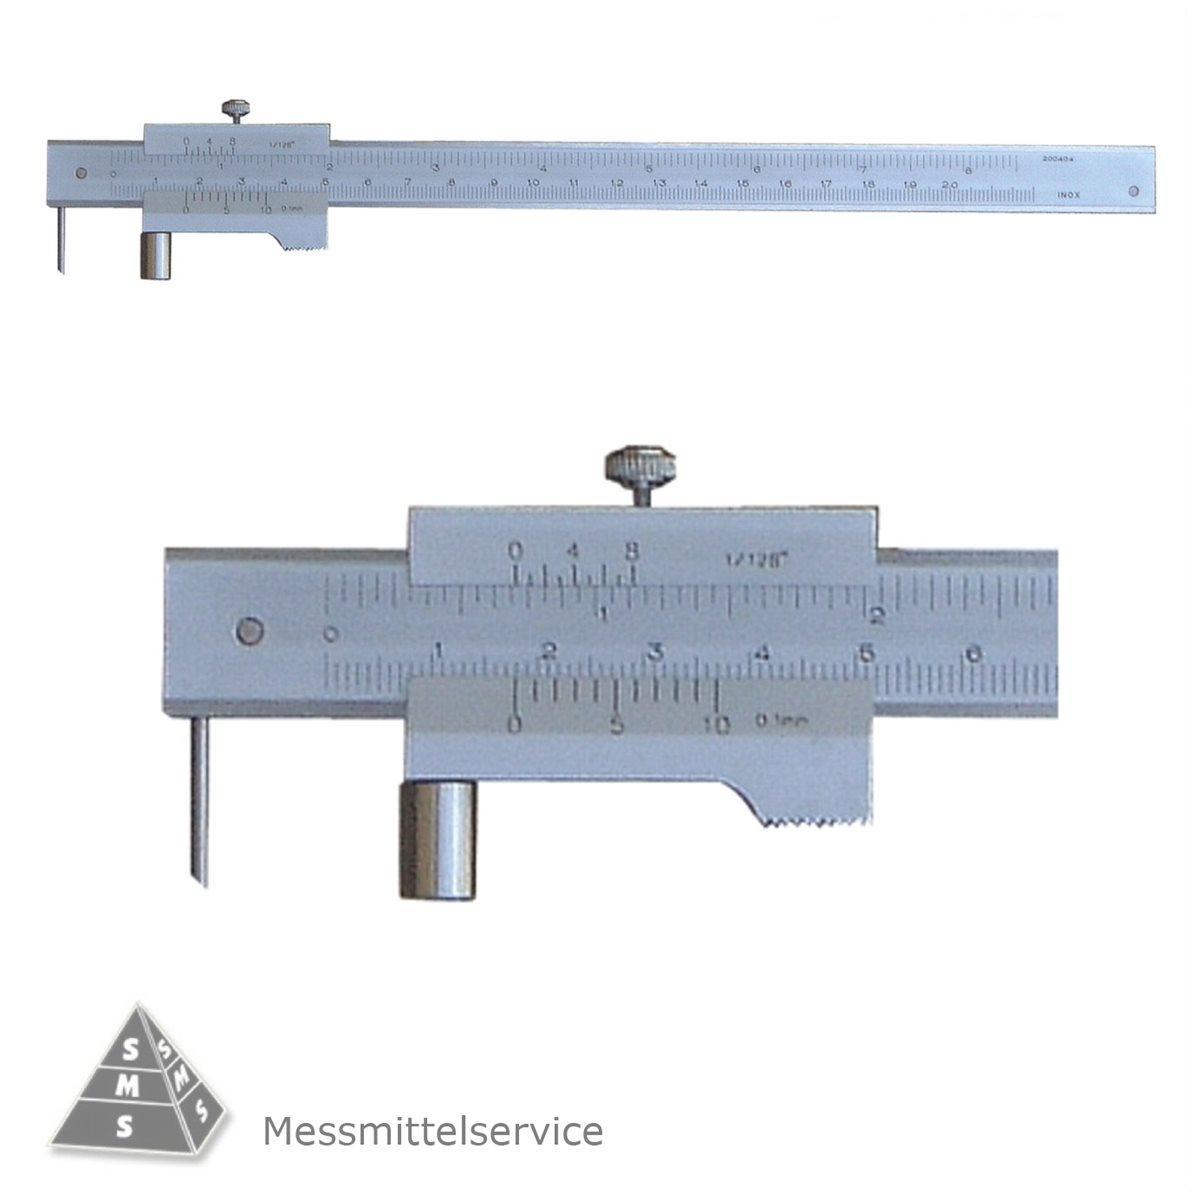 peter slotta messmittelservice - anreißmessschieber 200 oder 400 mm